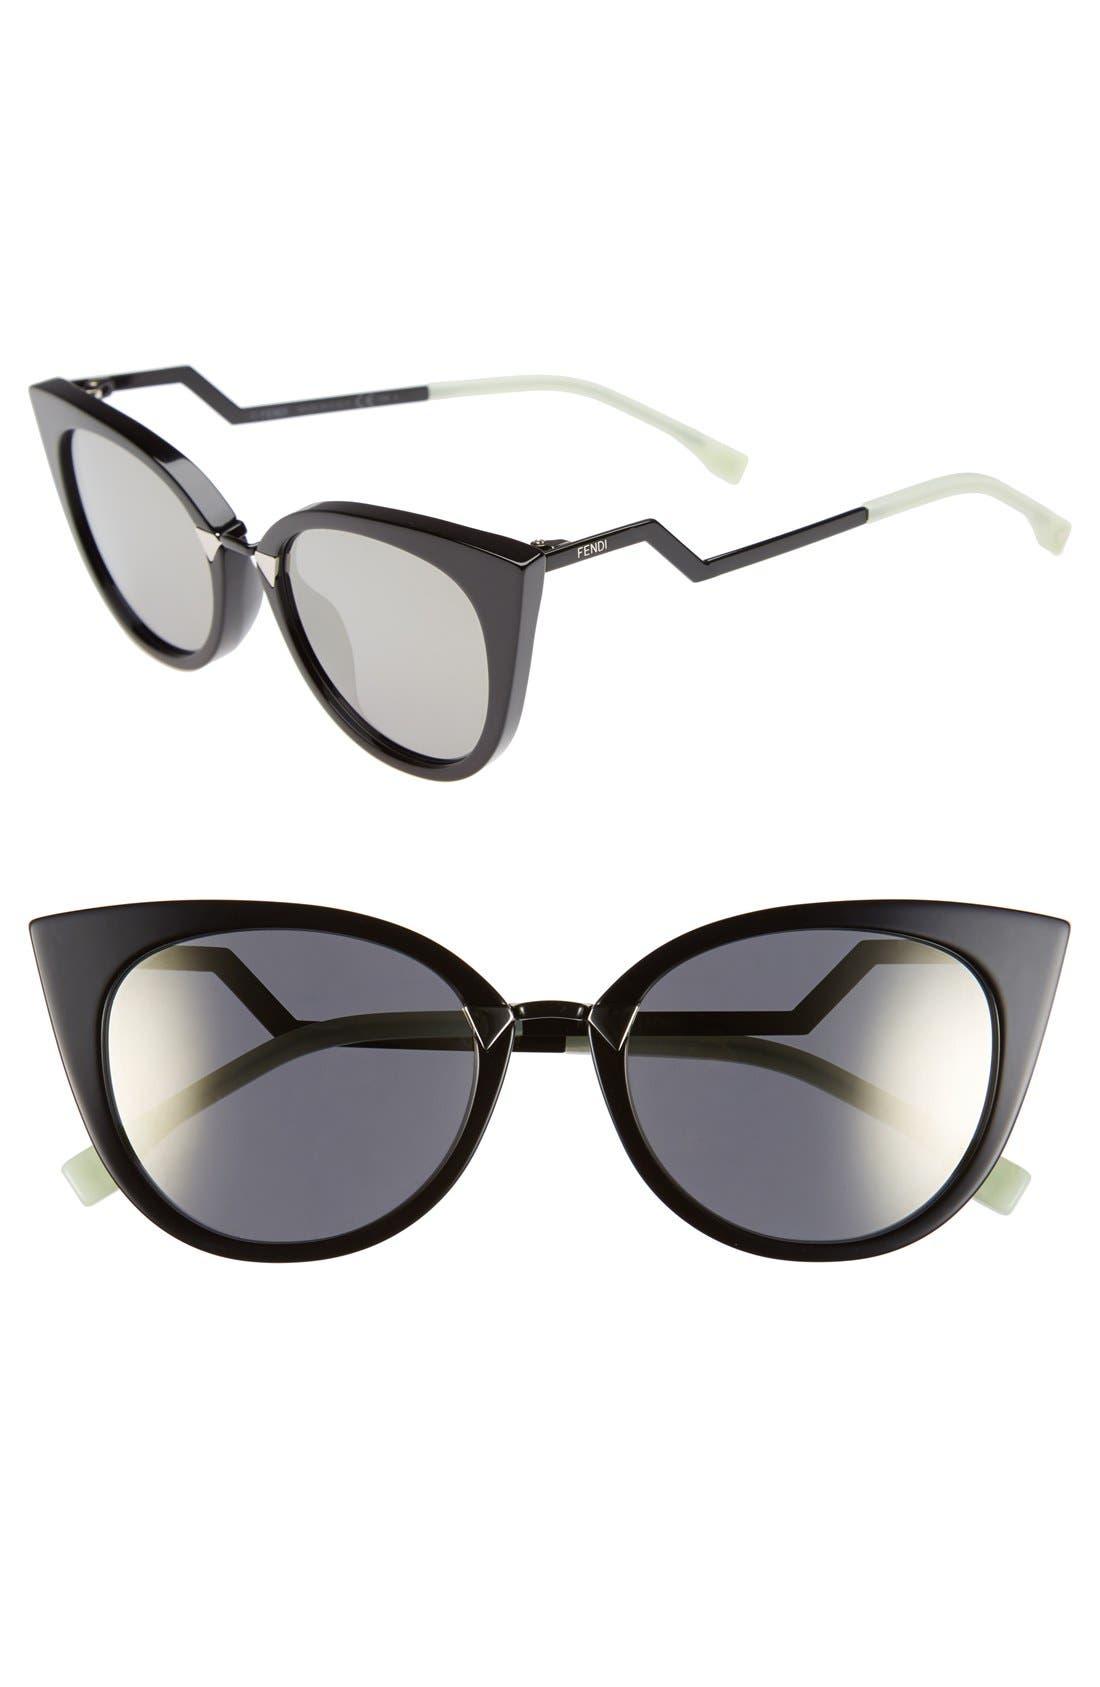 52mm Cat Eye Sunglasses,                         Main,                         color, Black